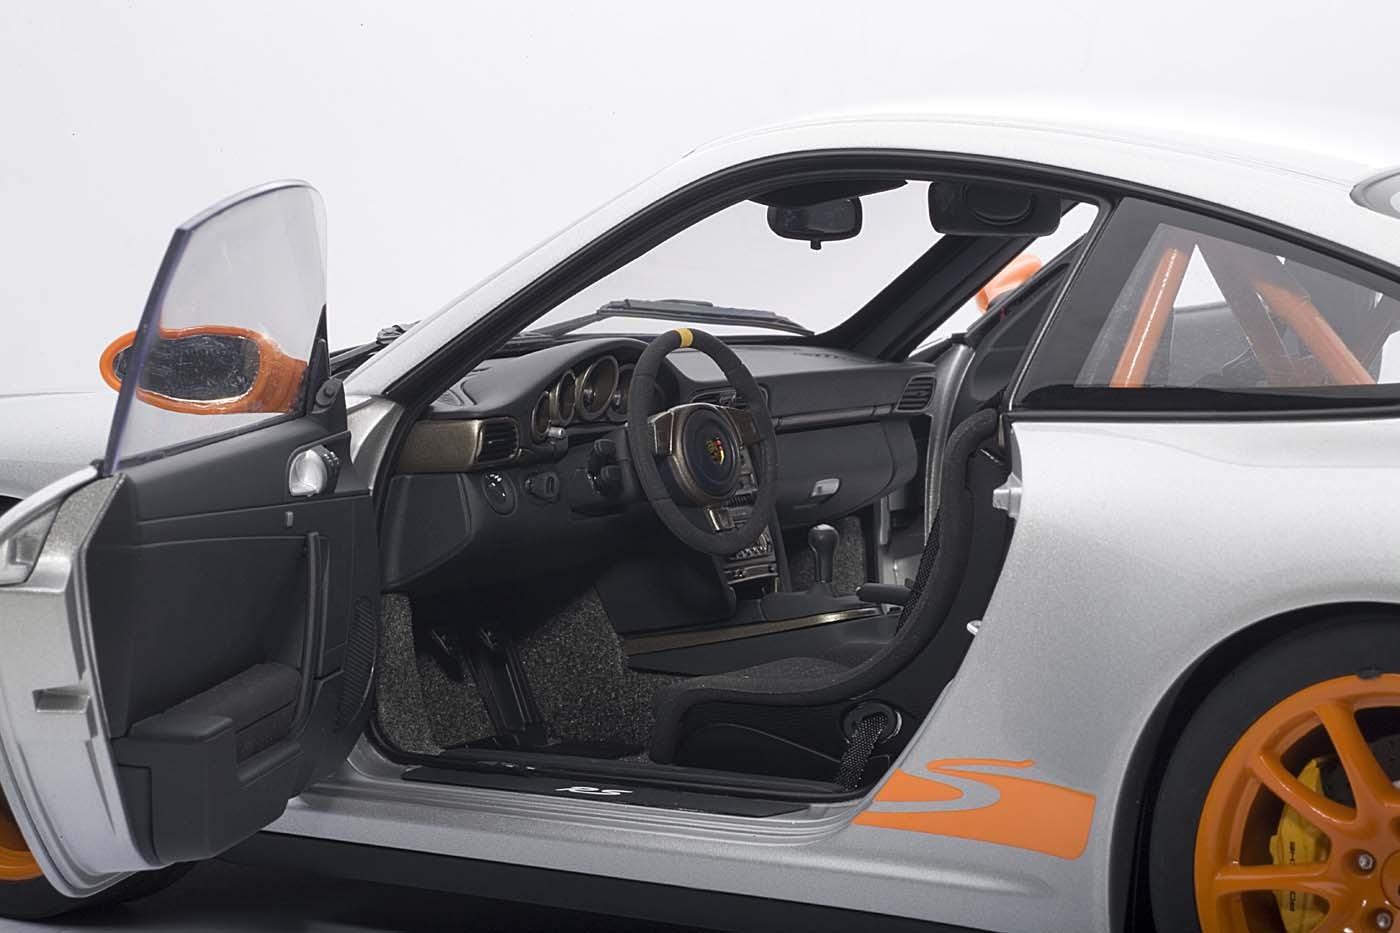 Porsche 911 (977) GT3 RS Silver w/Orange Stripes 12119 AUTOart Scale 1:12